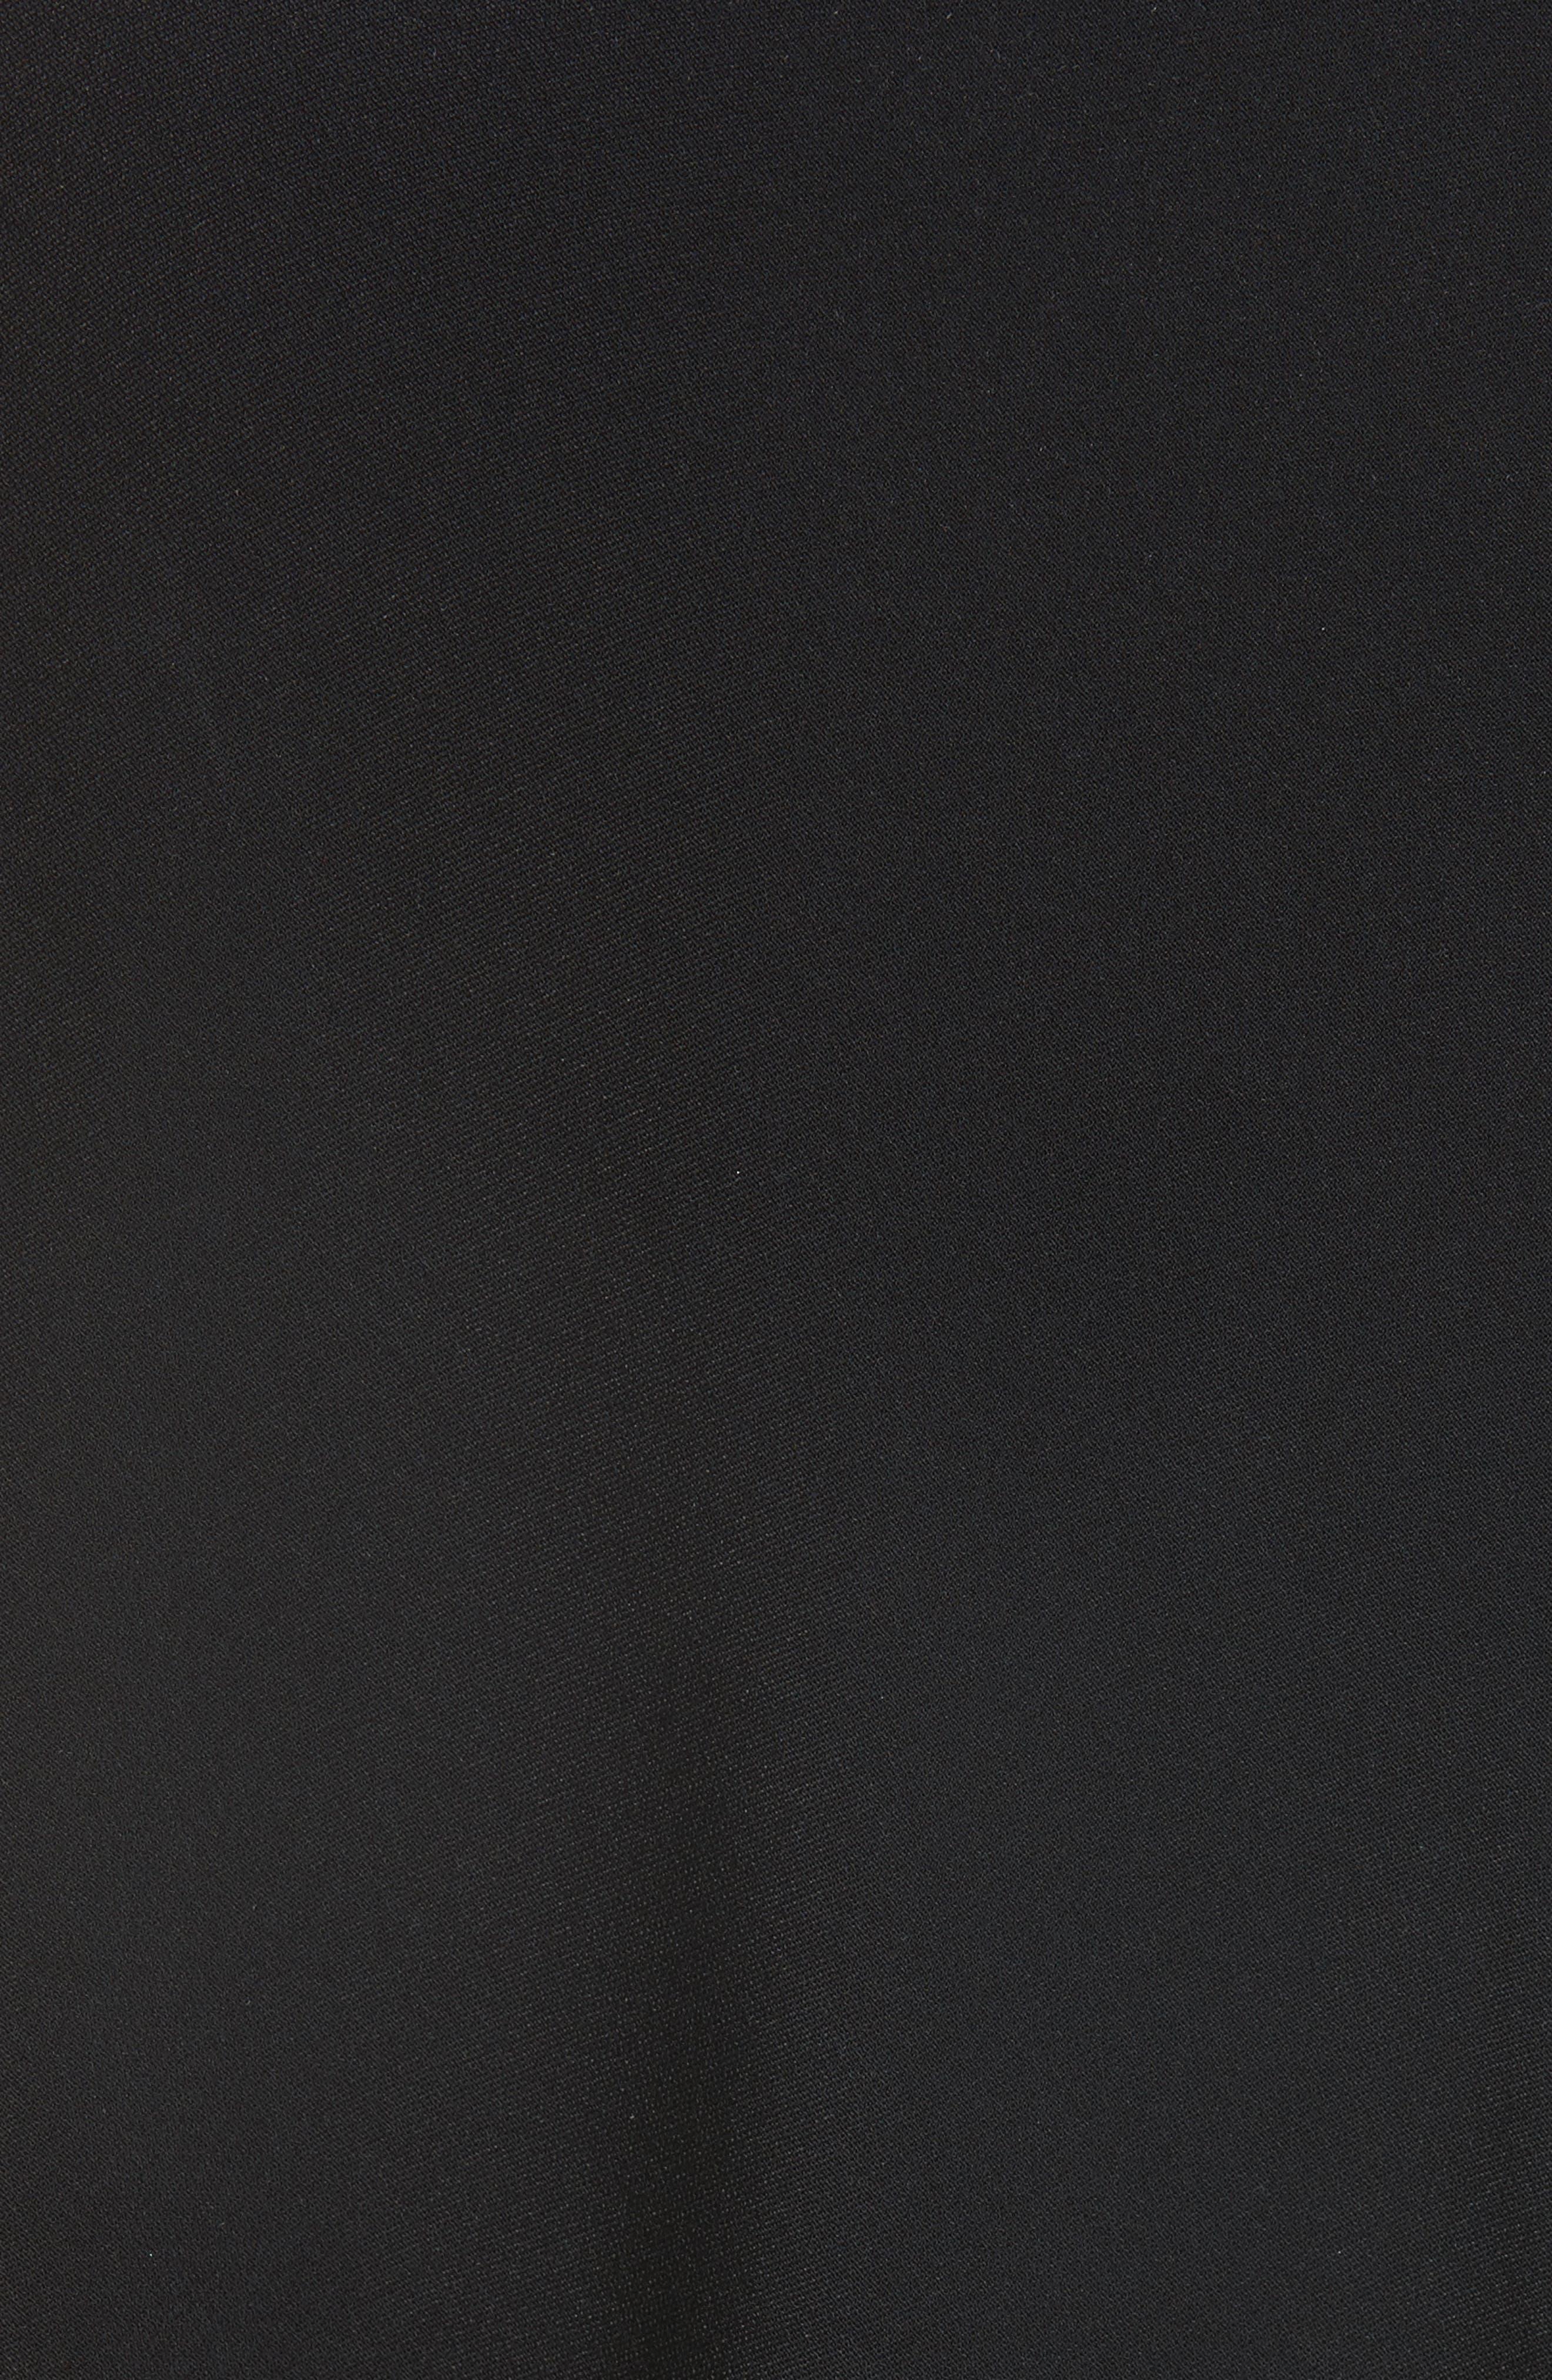 Alternate Image 3  - Stella McCartney Fringe Overlay Stretch Cady Dress